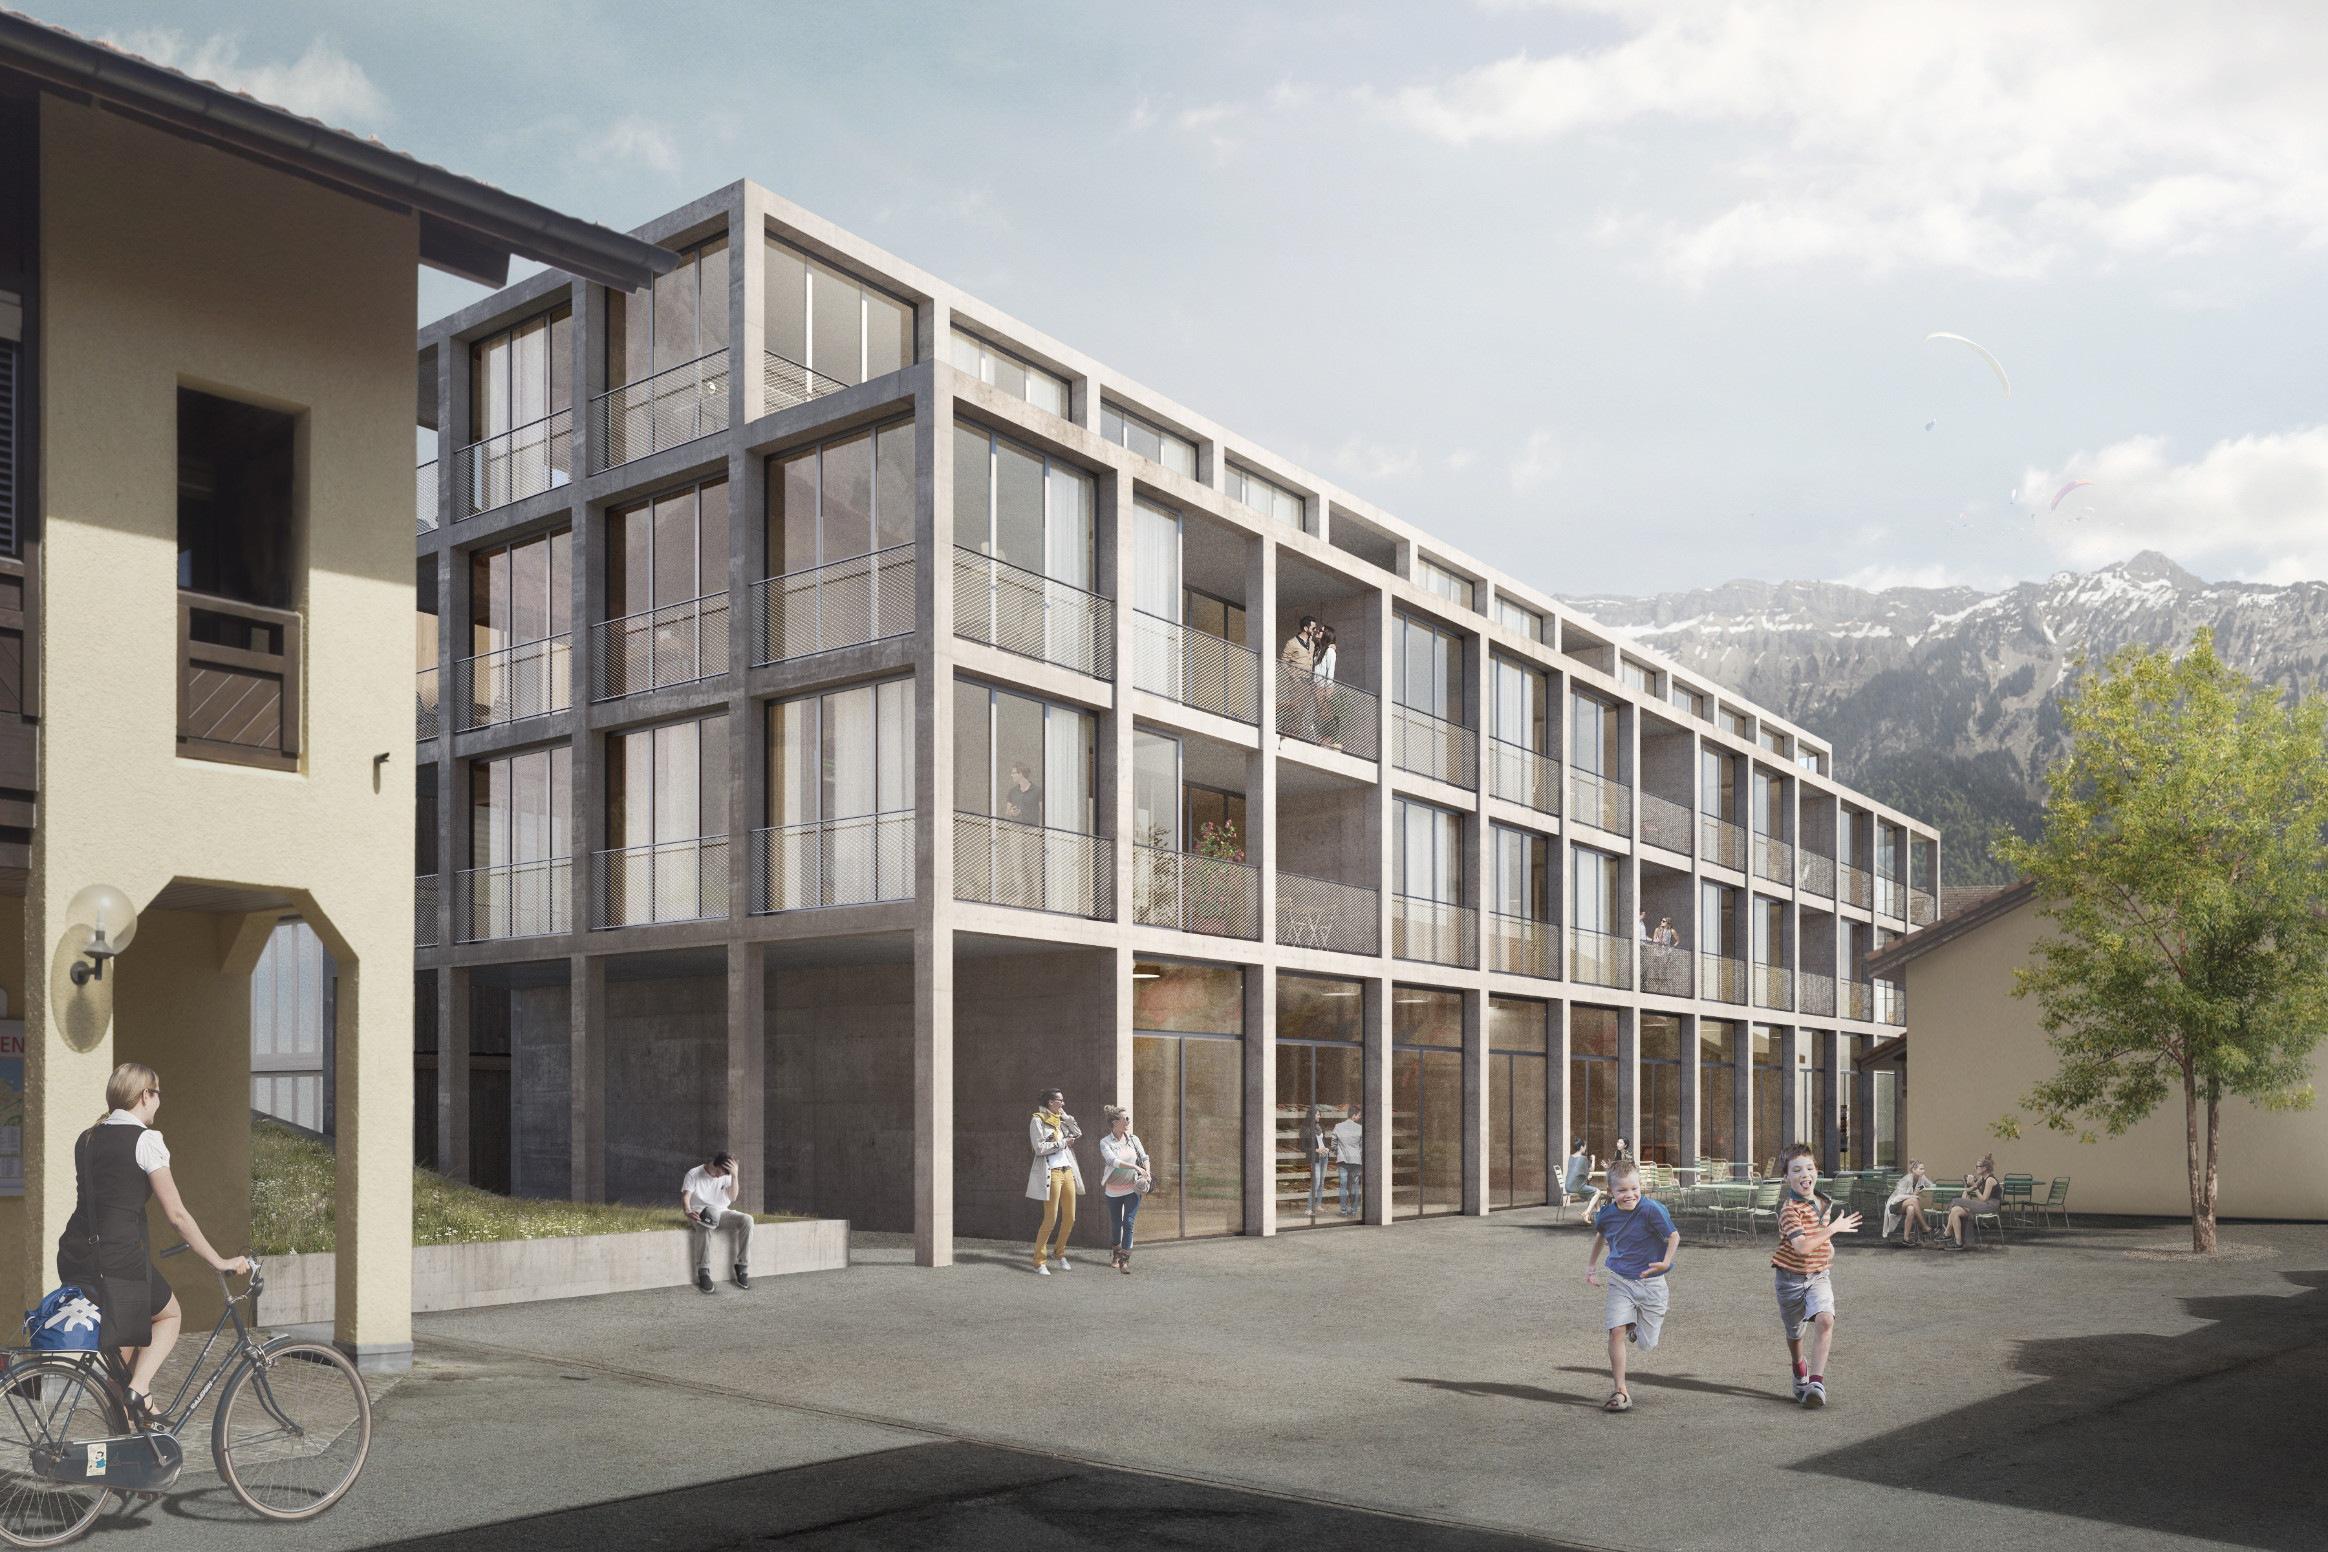 439 2 15101 Schär Buri Architekten AG WBW Ruag Areal Unterseen EXT a 150521